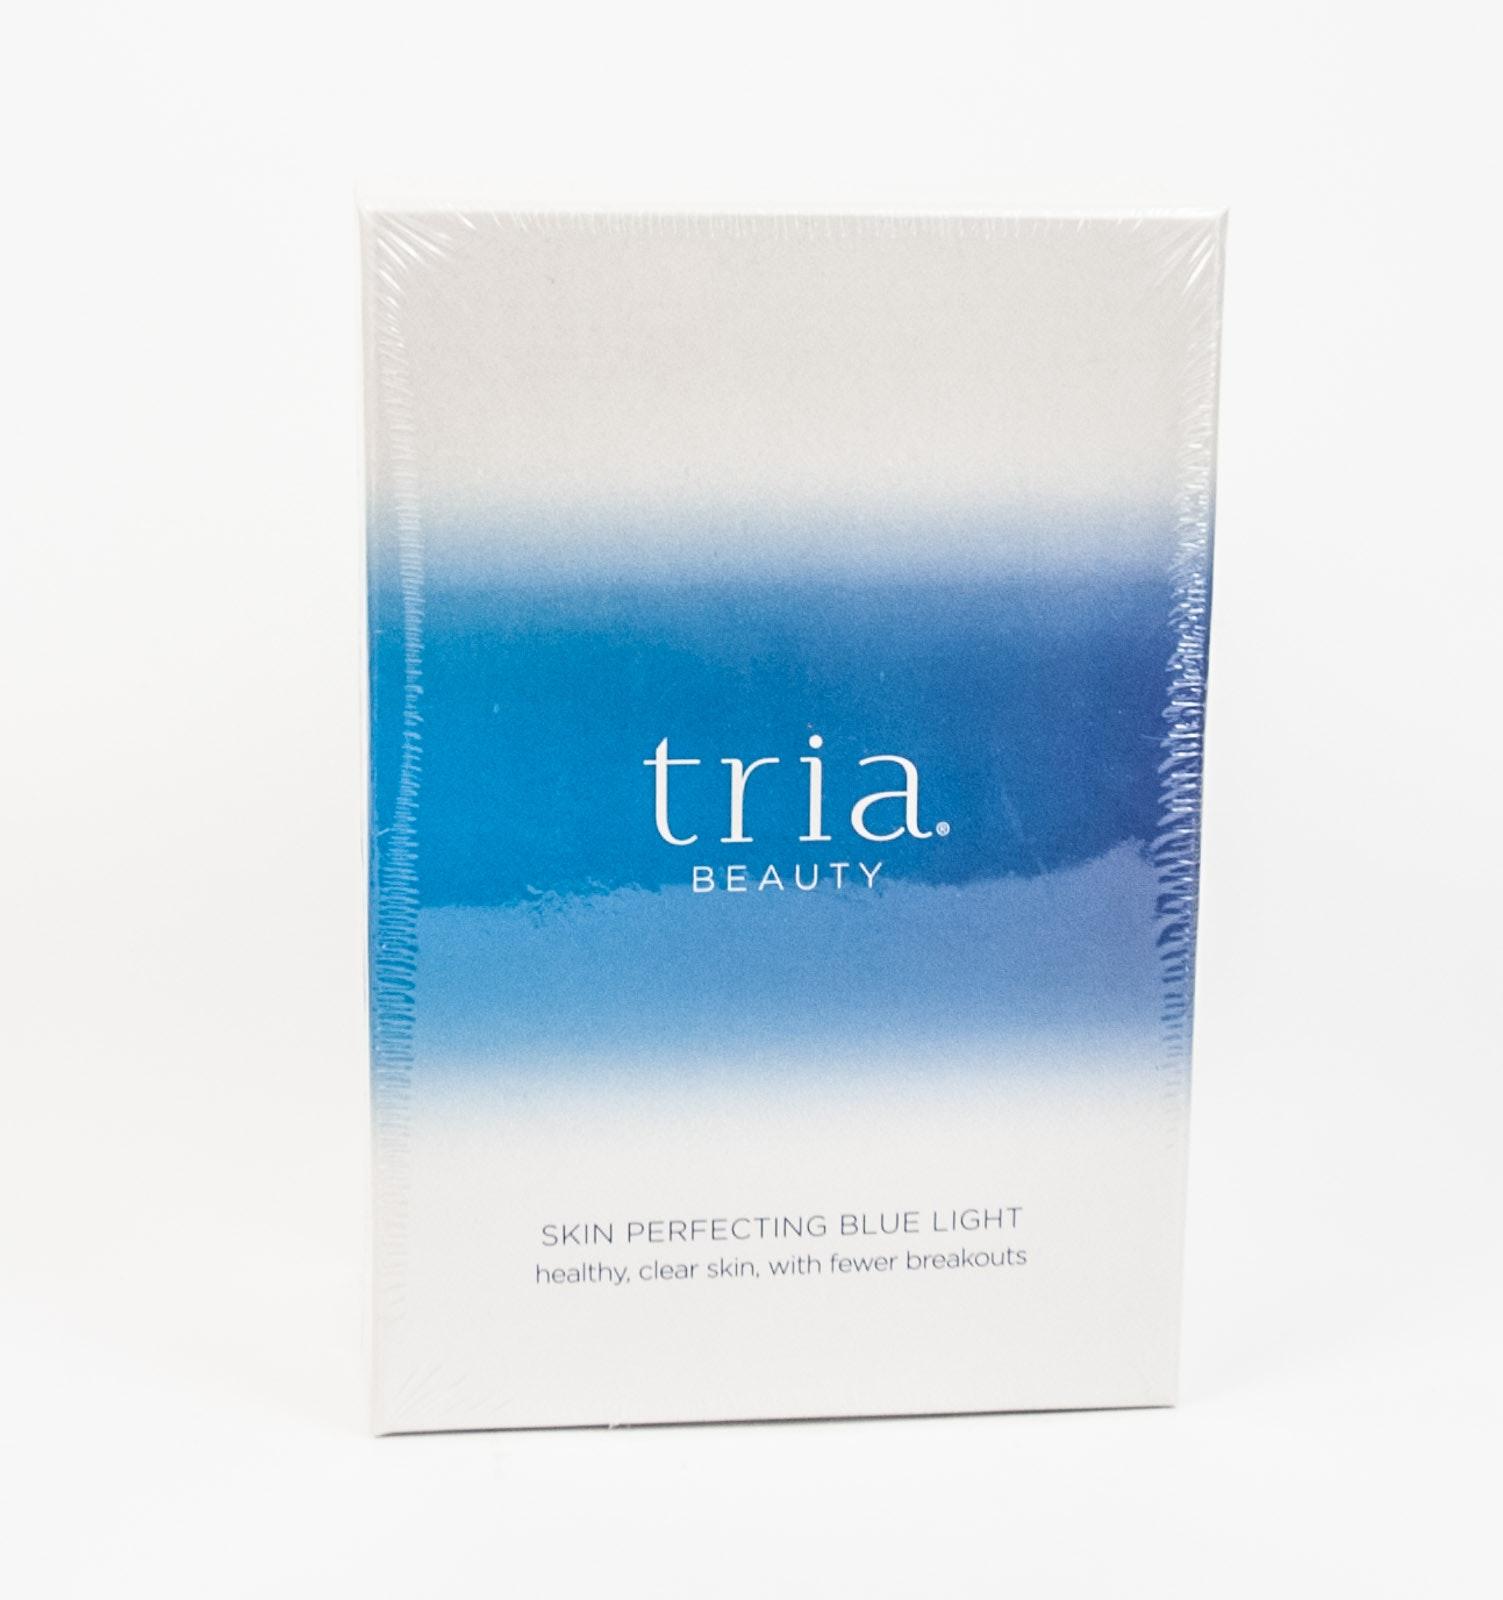 Tria Beauty Blue Light